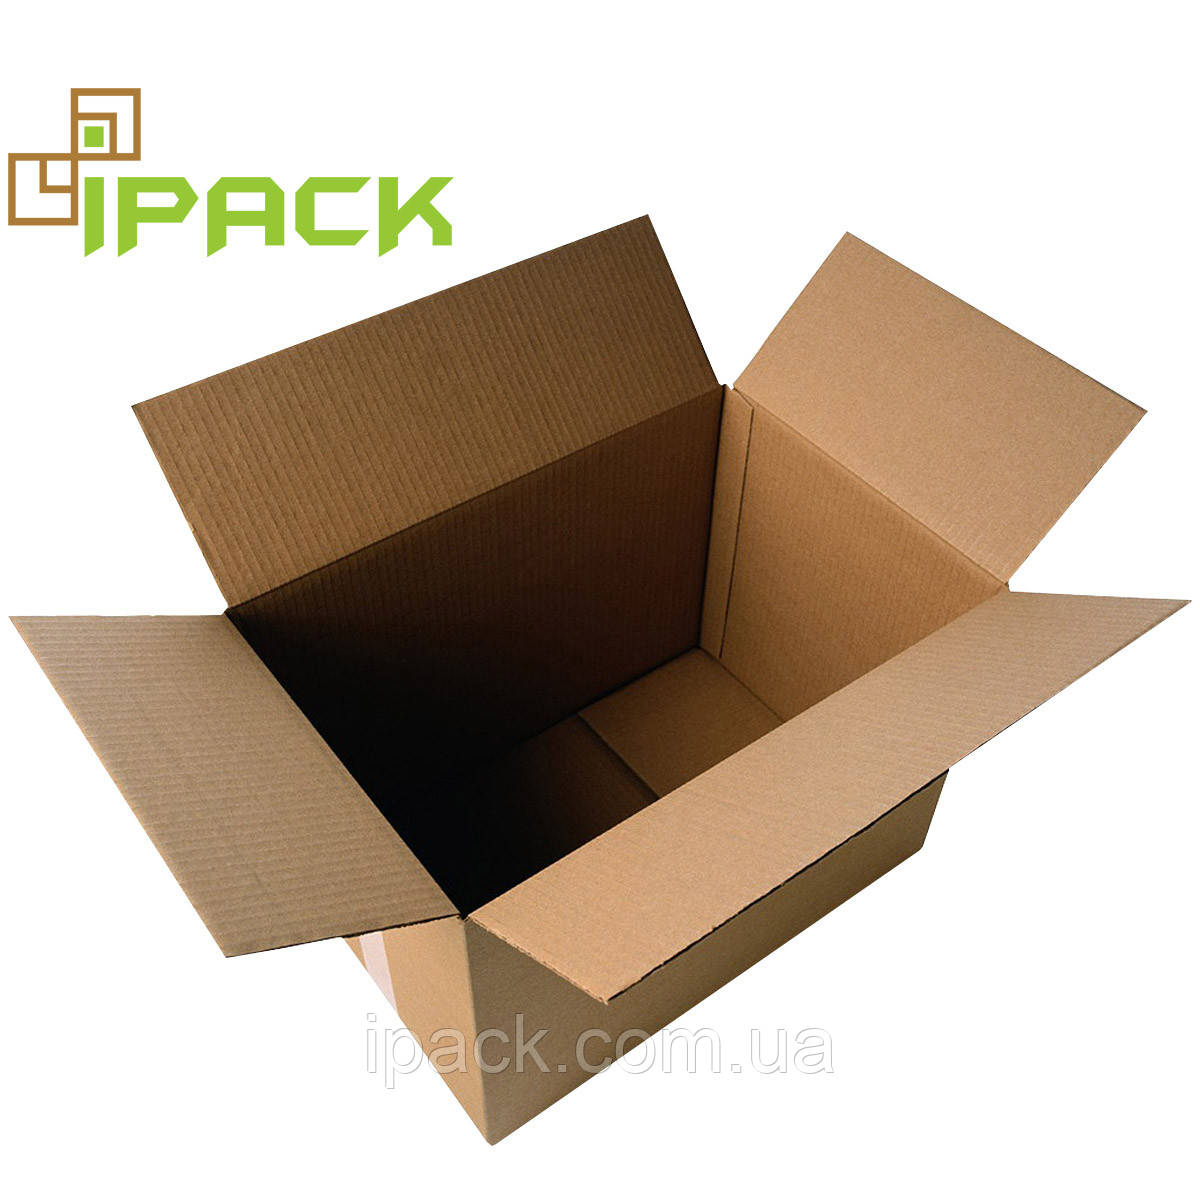 Гофроящик 300*300*310 мм бурий четырехклапанный картонний короб